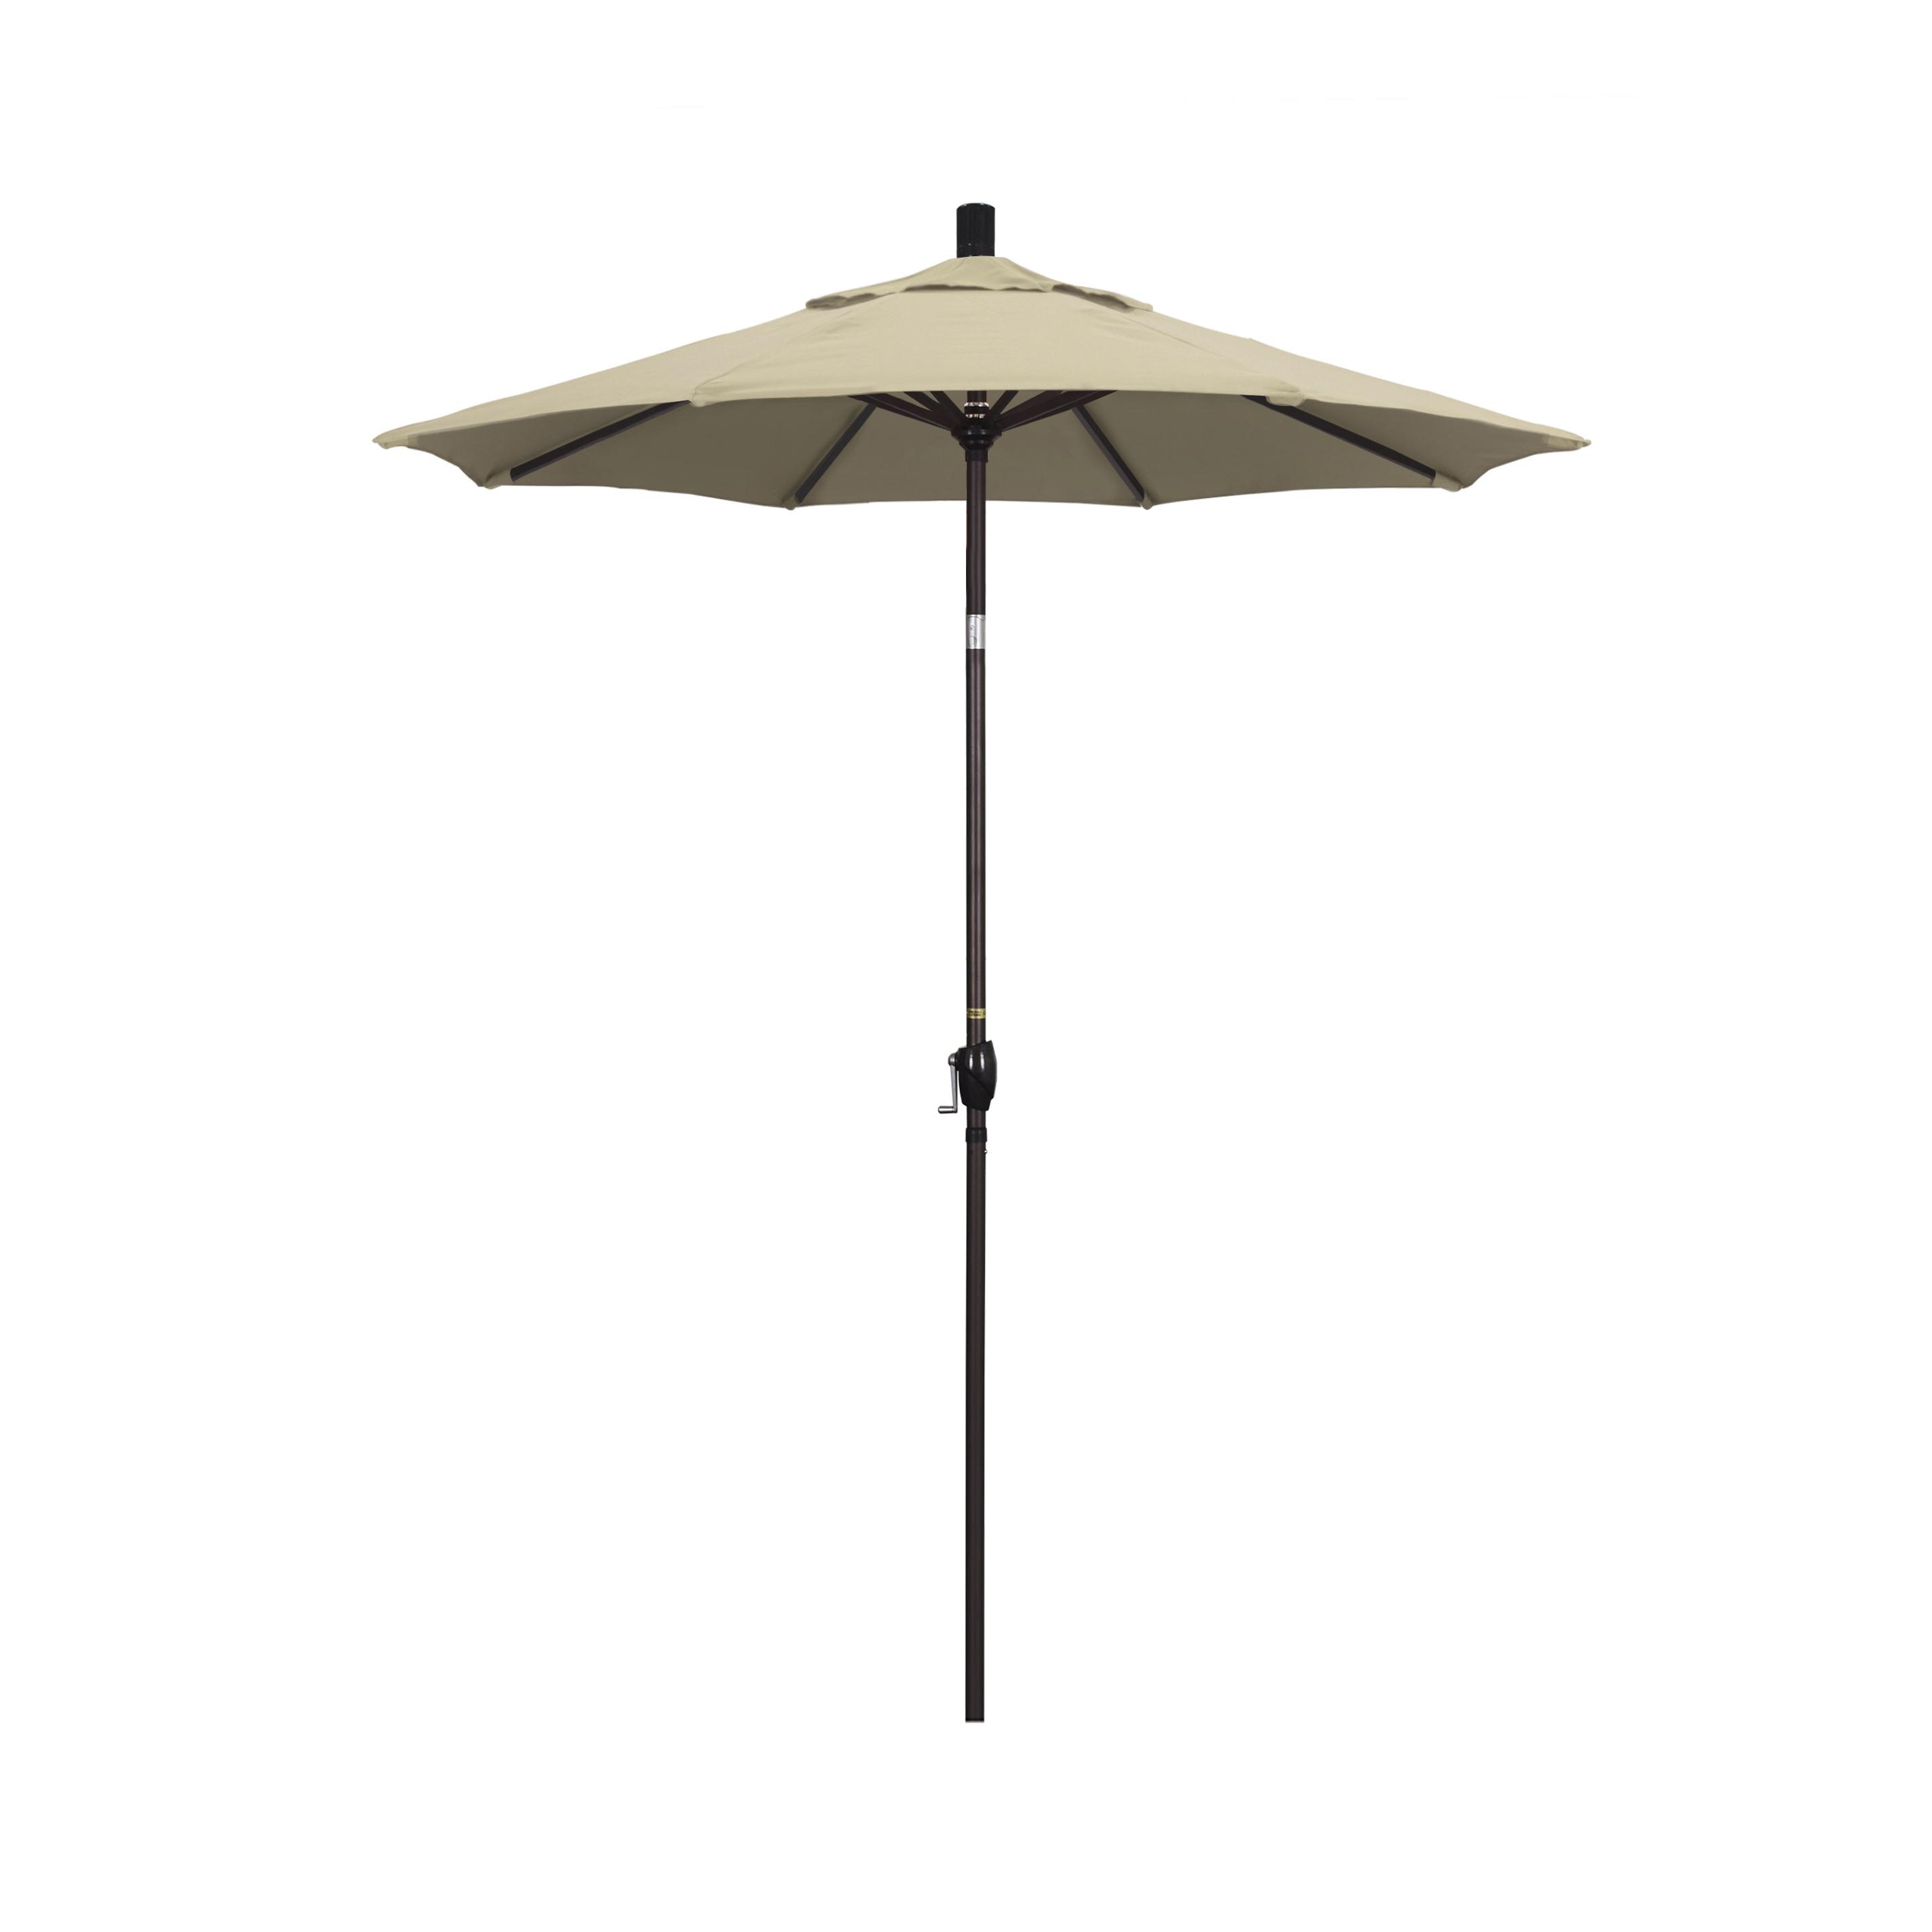 Wetherby Market Umbrellas Within Well Known Wallach 6' Market Sunbrella Umbrella (View 11 of 20)